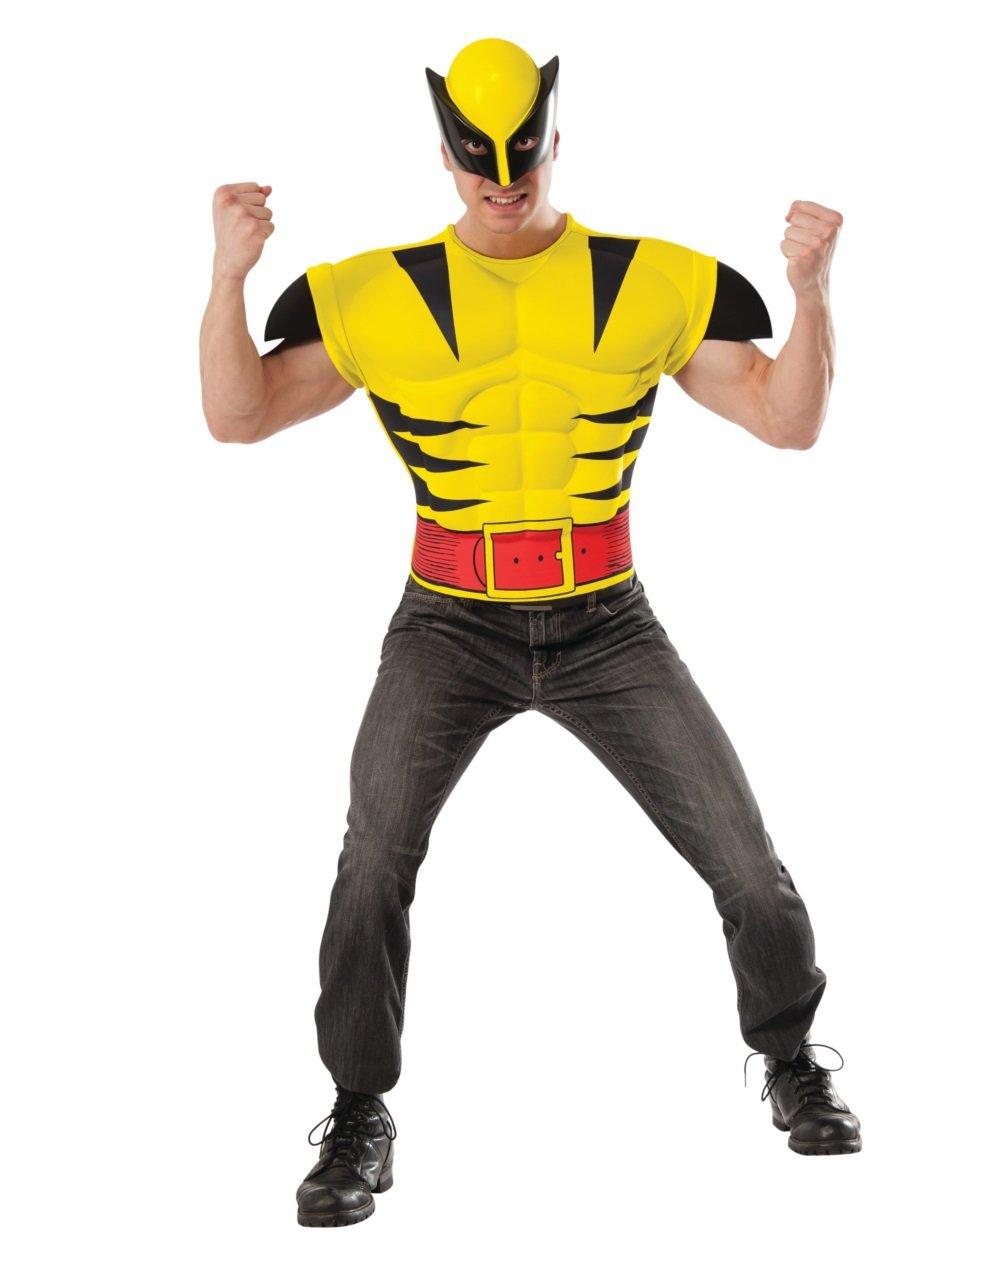 Marvel Comic Wolverine X-Men Muscle Shirt Adult Costume Size: Standard #820022S